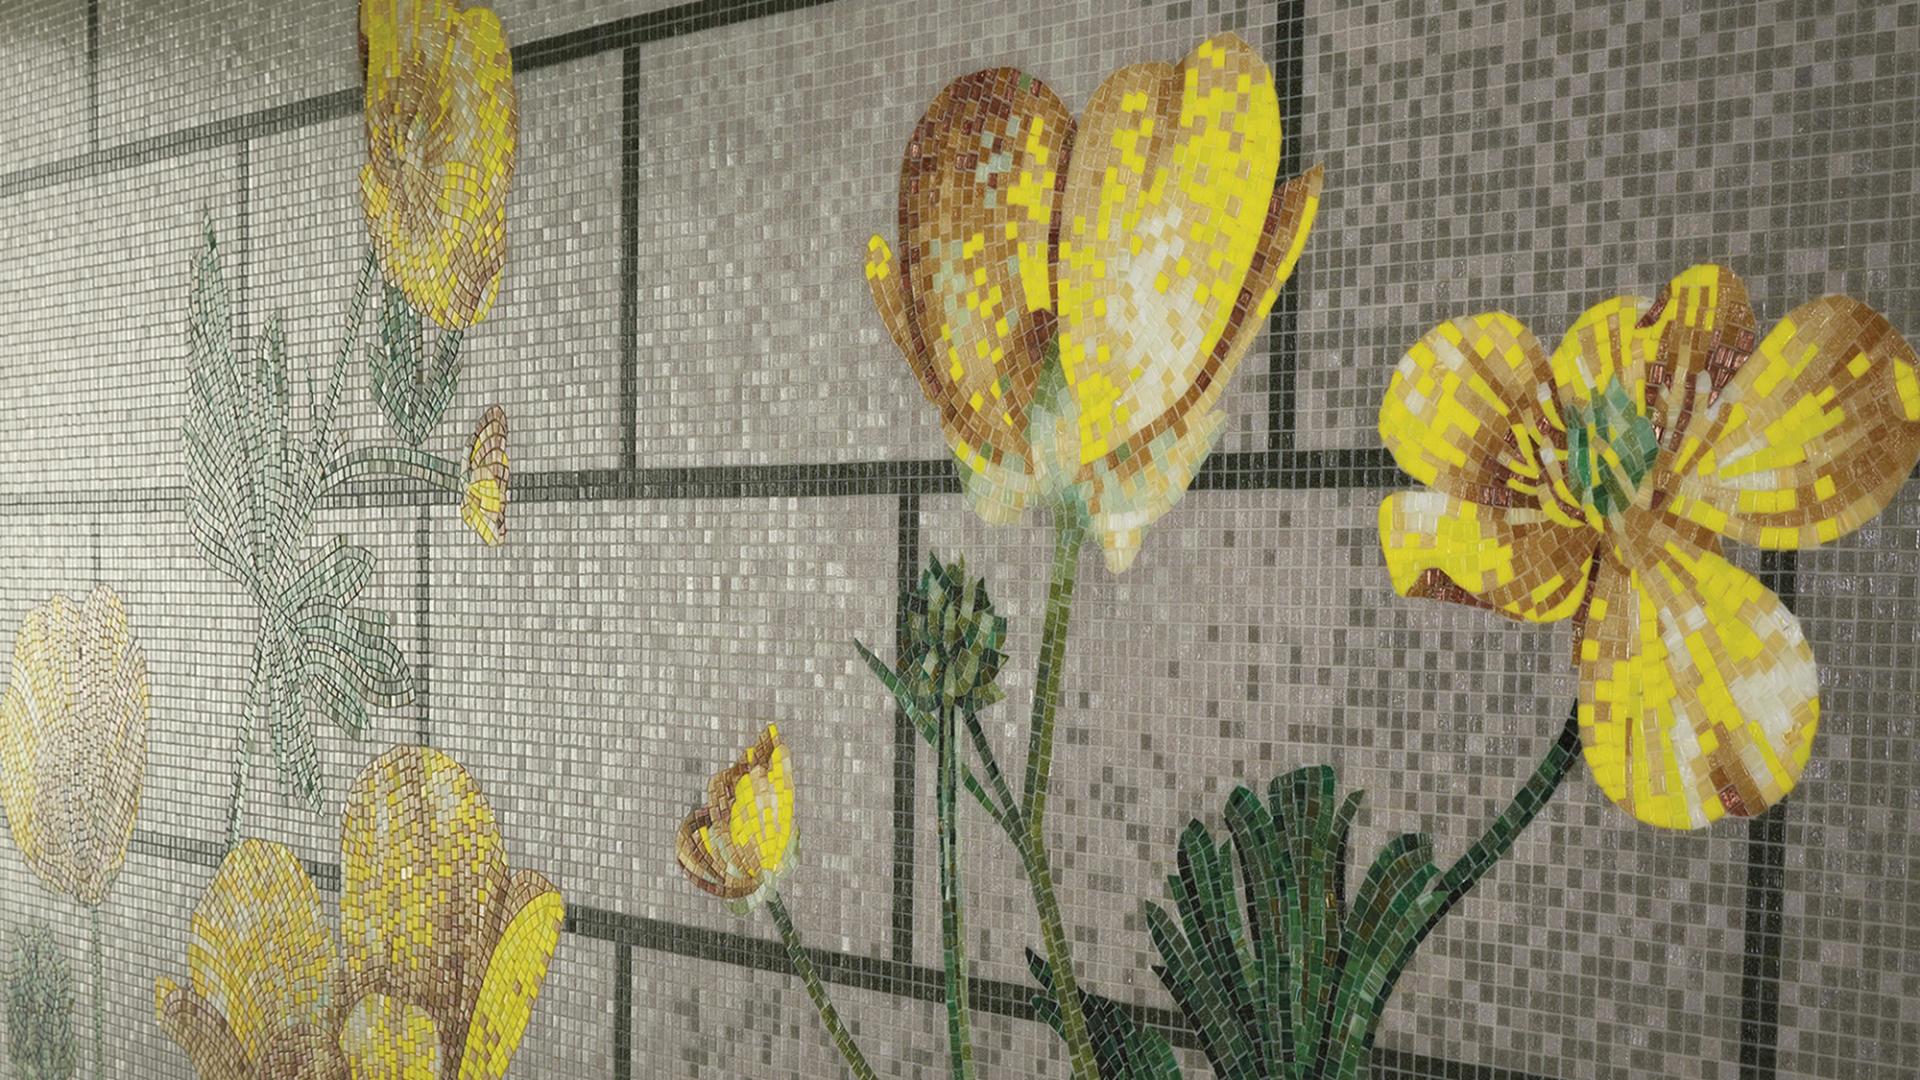 Mosaico con decoro floreale Ranunculus design KIKI VAN EIJK